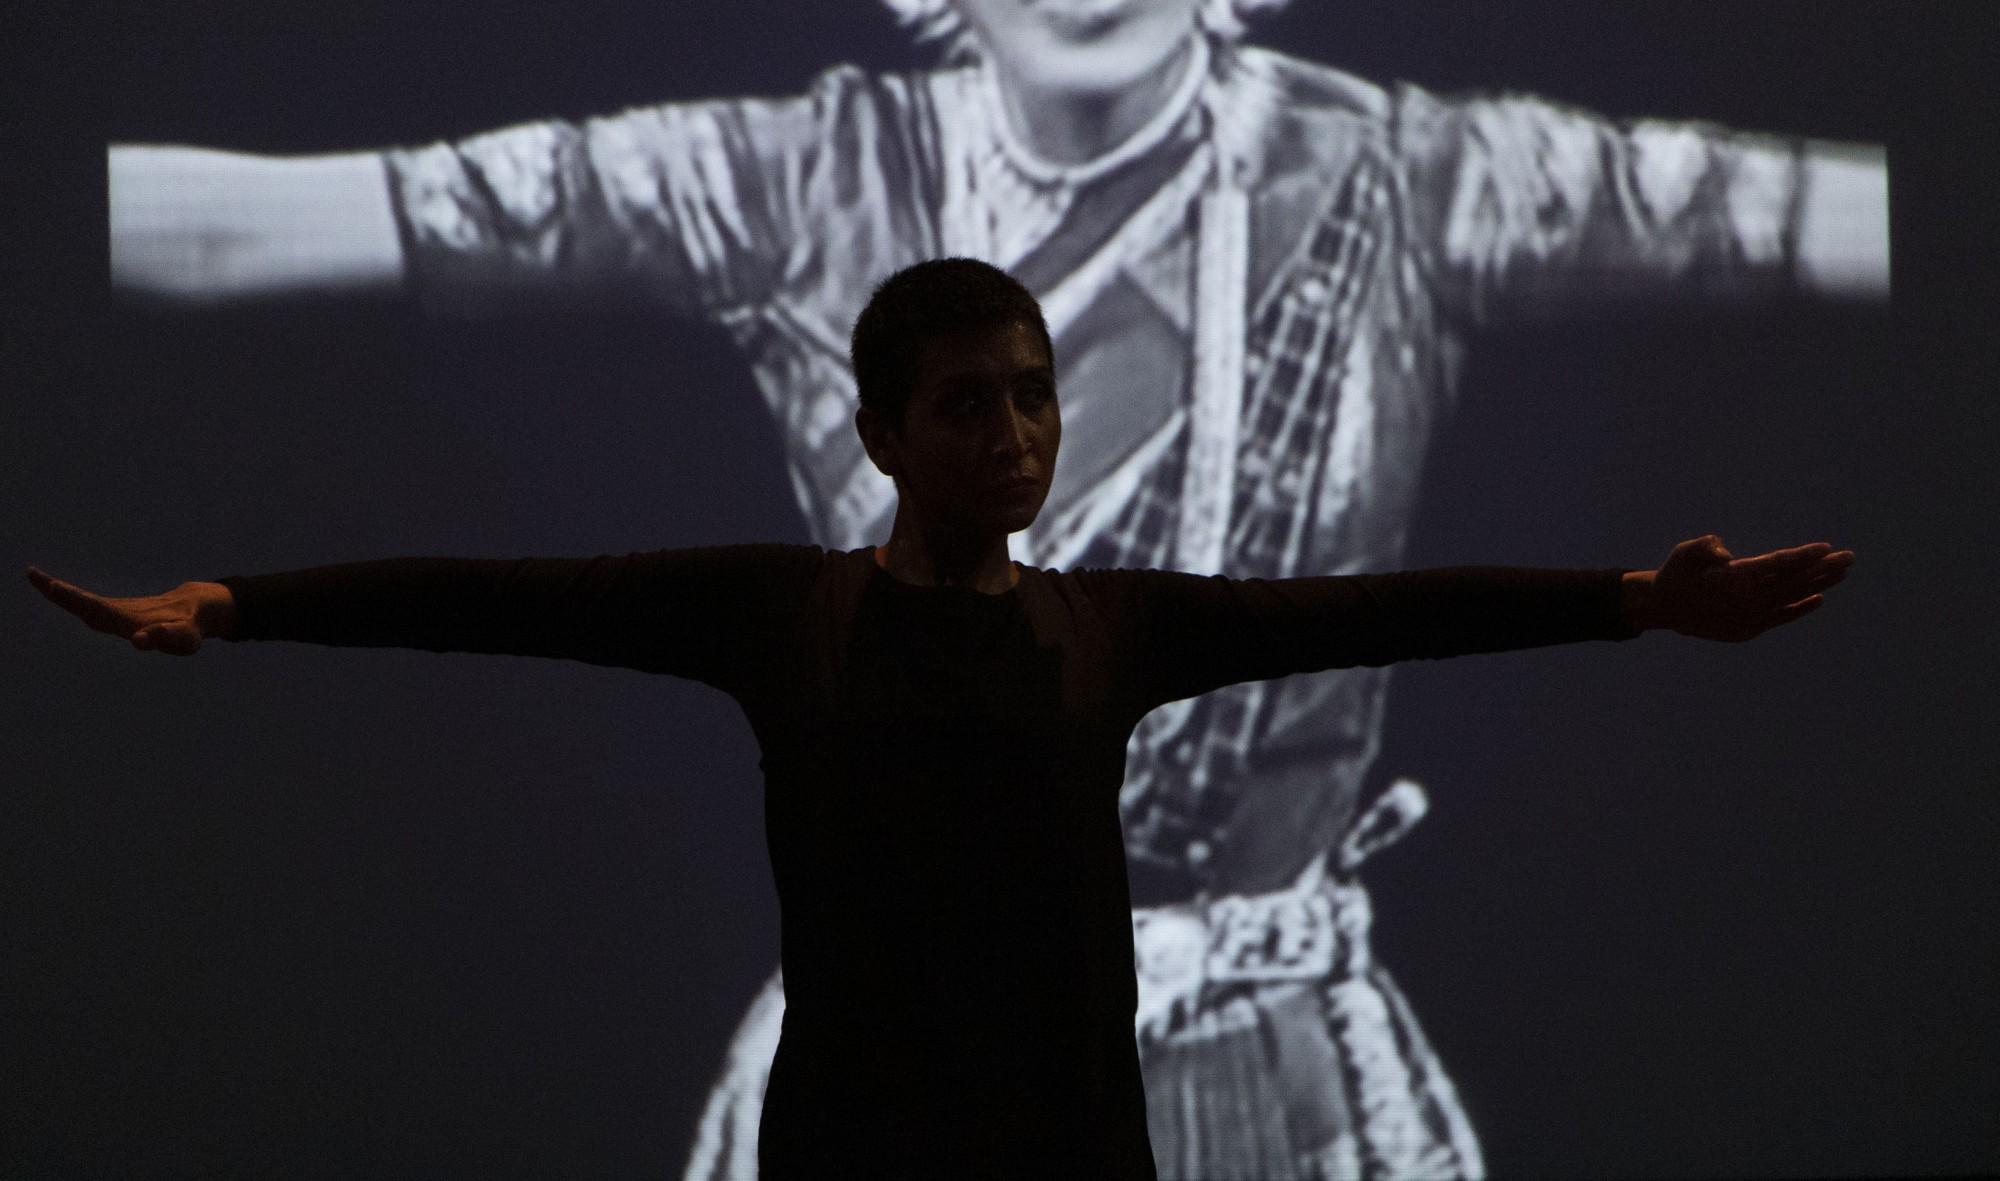 'Rewa: The Unseen' (2019), Devika Bilimoria. Sangam Performing Arts Festival of South Asia and Diaspora. Photo by Arun Muñoz.